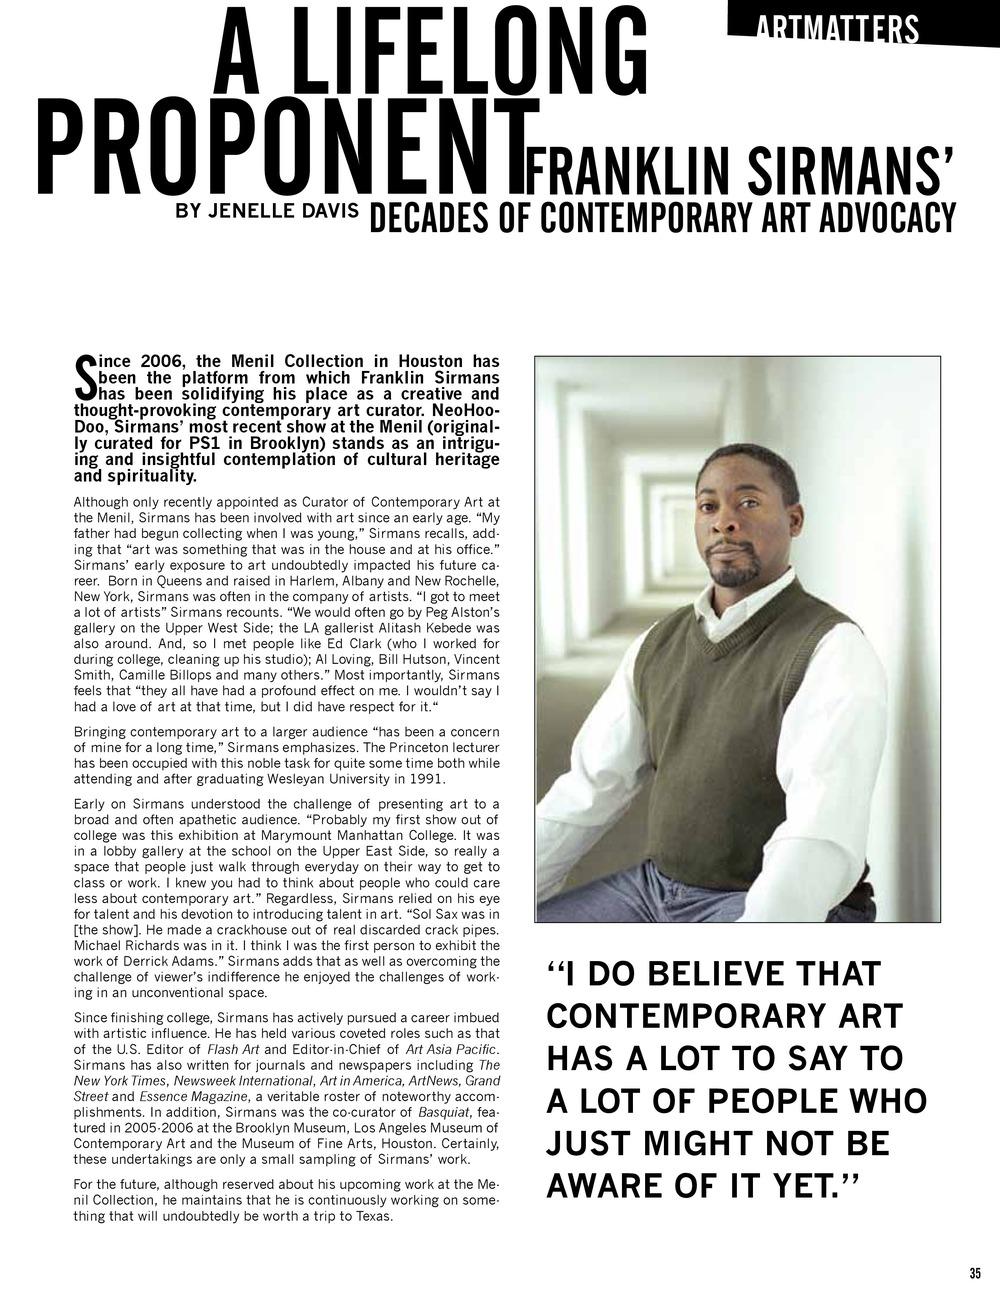 FranklinSirmans-page-0.jpg